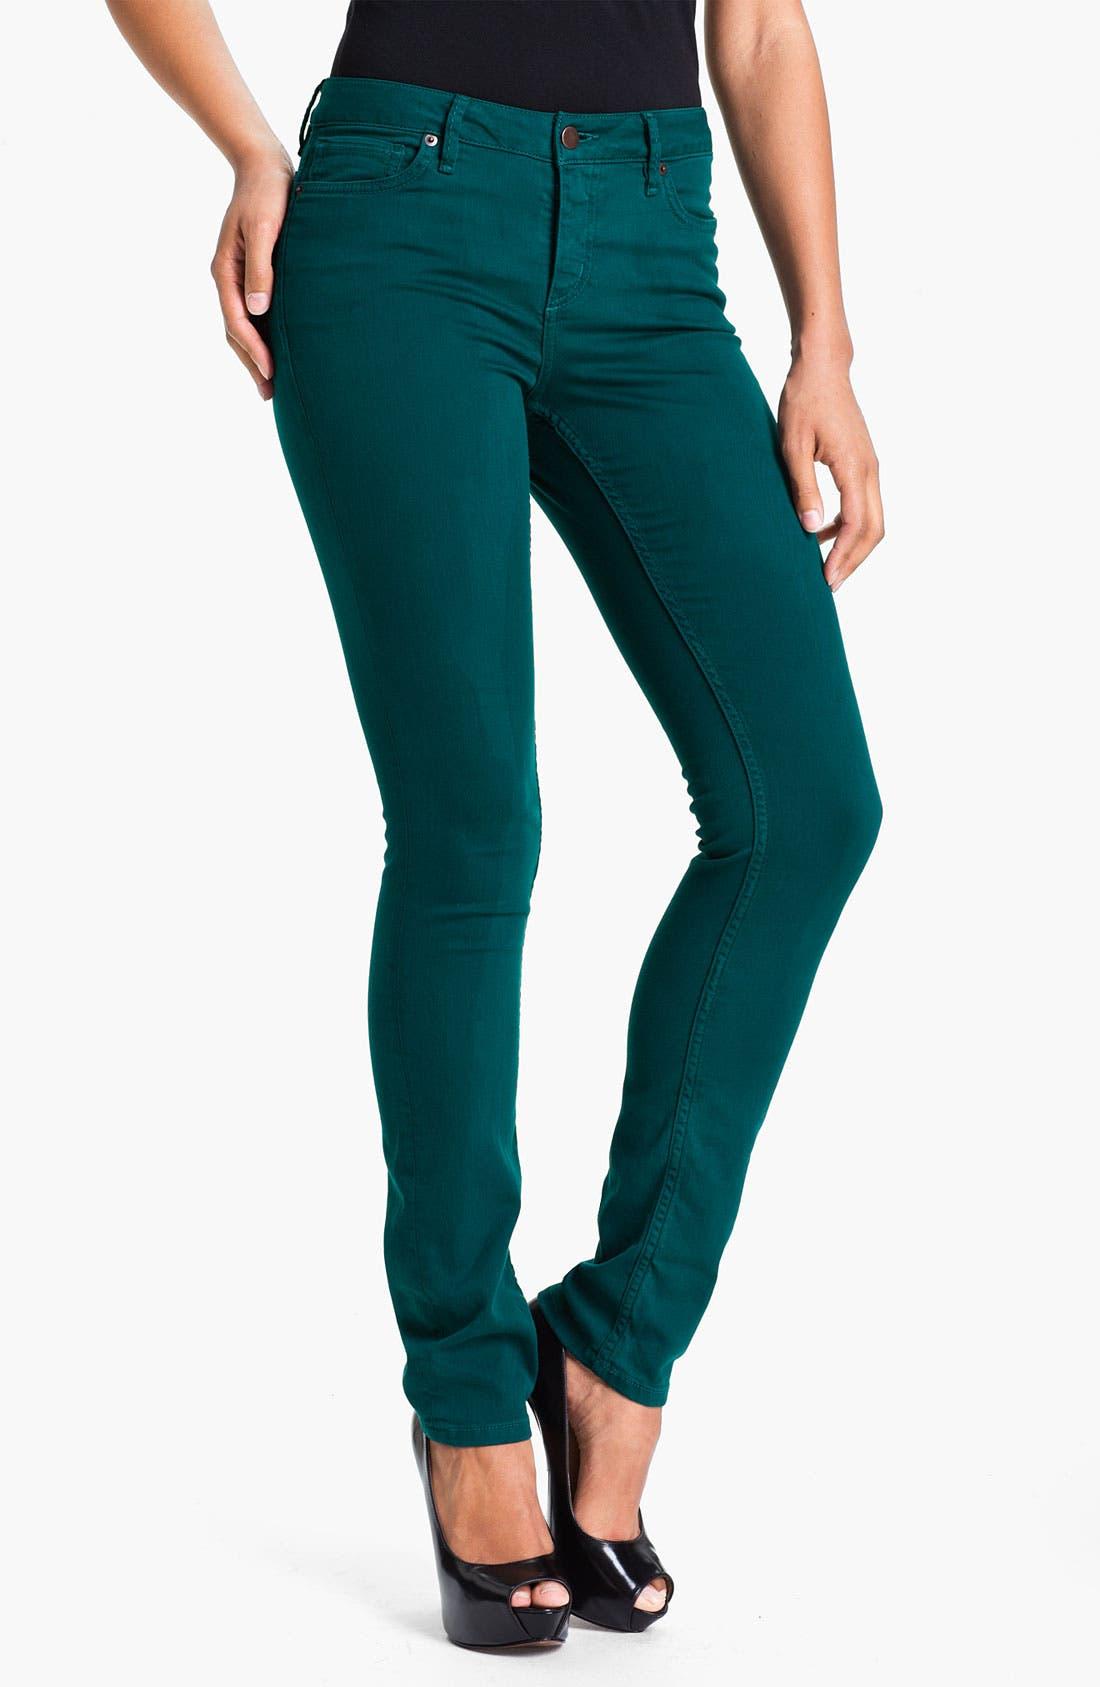 Alternate Image 1 Selected - Christopher Blue 'Sophia' Skinny Twill Jeans